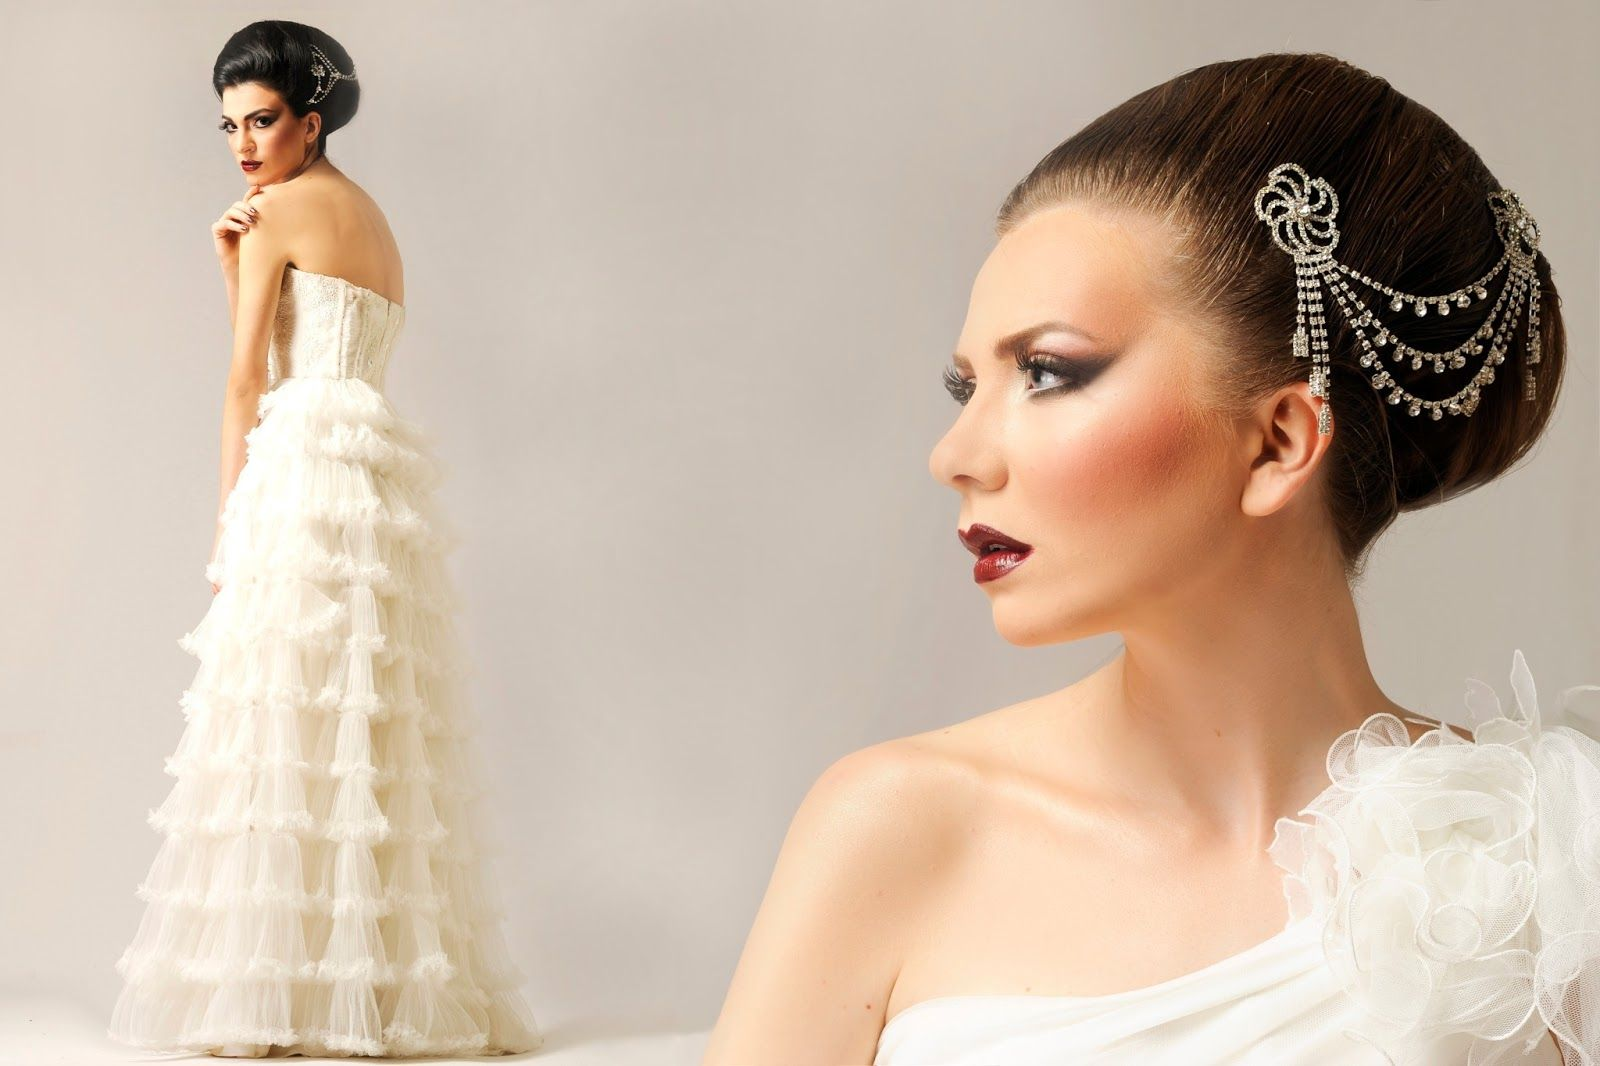 Mac Bridal Makeup Looks ΝΥΦΙΚΟ ΜΑΚΙΓΙΑΖ BRIDAL MAKEUP